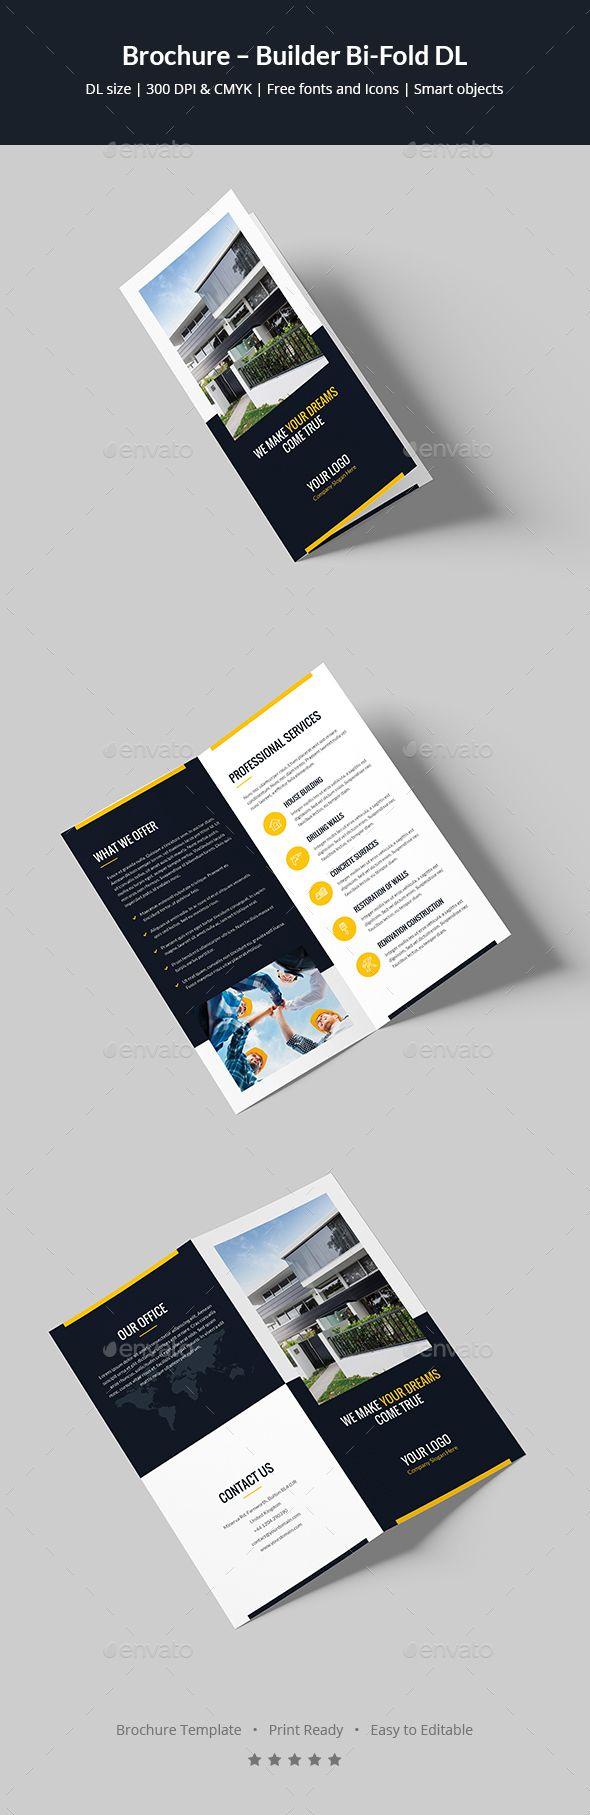 Brochure – Builder Bi-Fold DL   Leporello